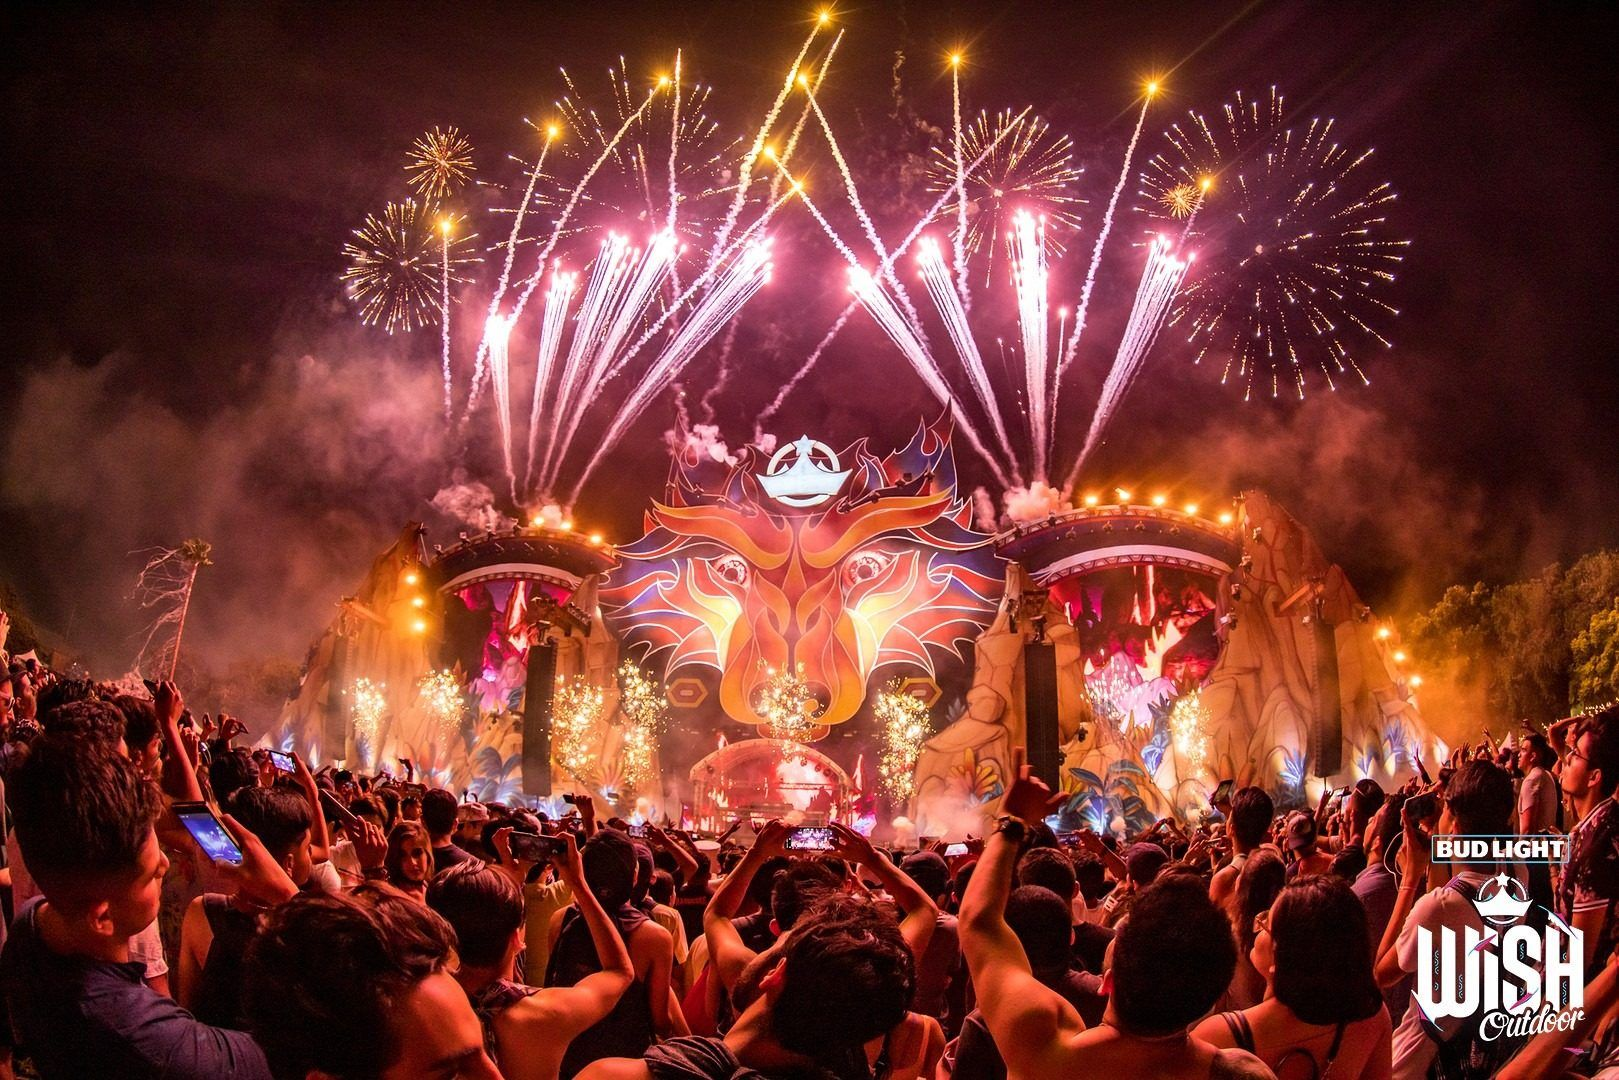 Festivales de música electrónica en México - Wish Outdoor